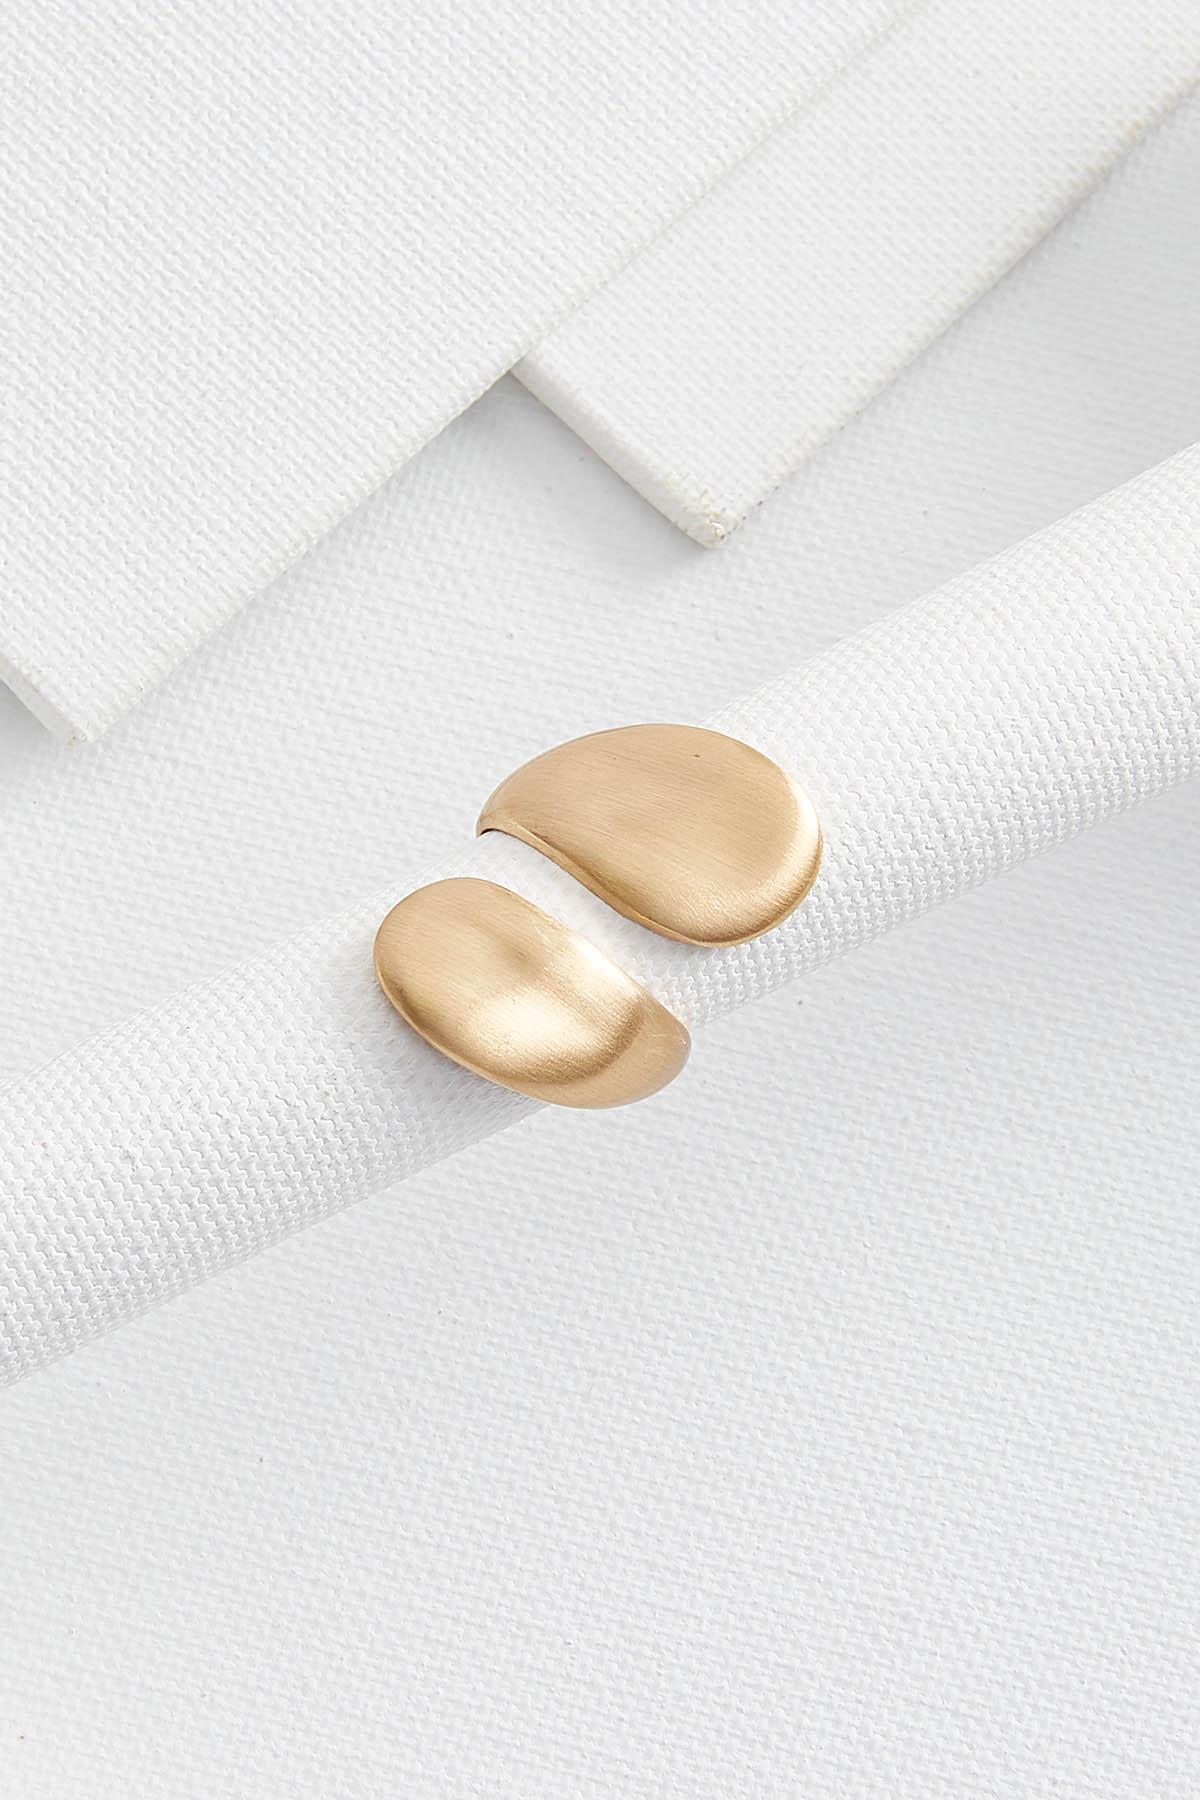 Brushed Gold Wrap Ring